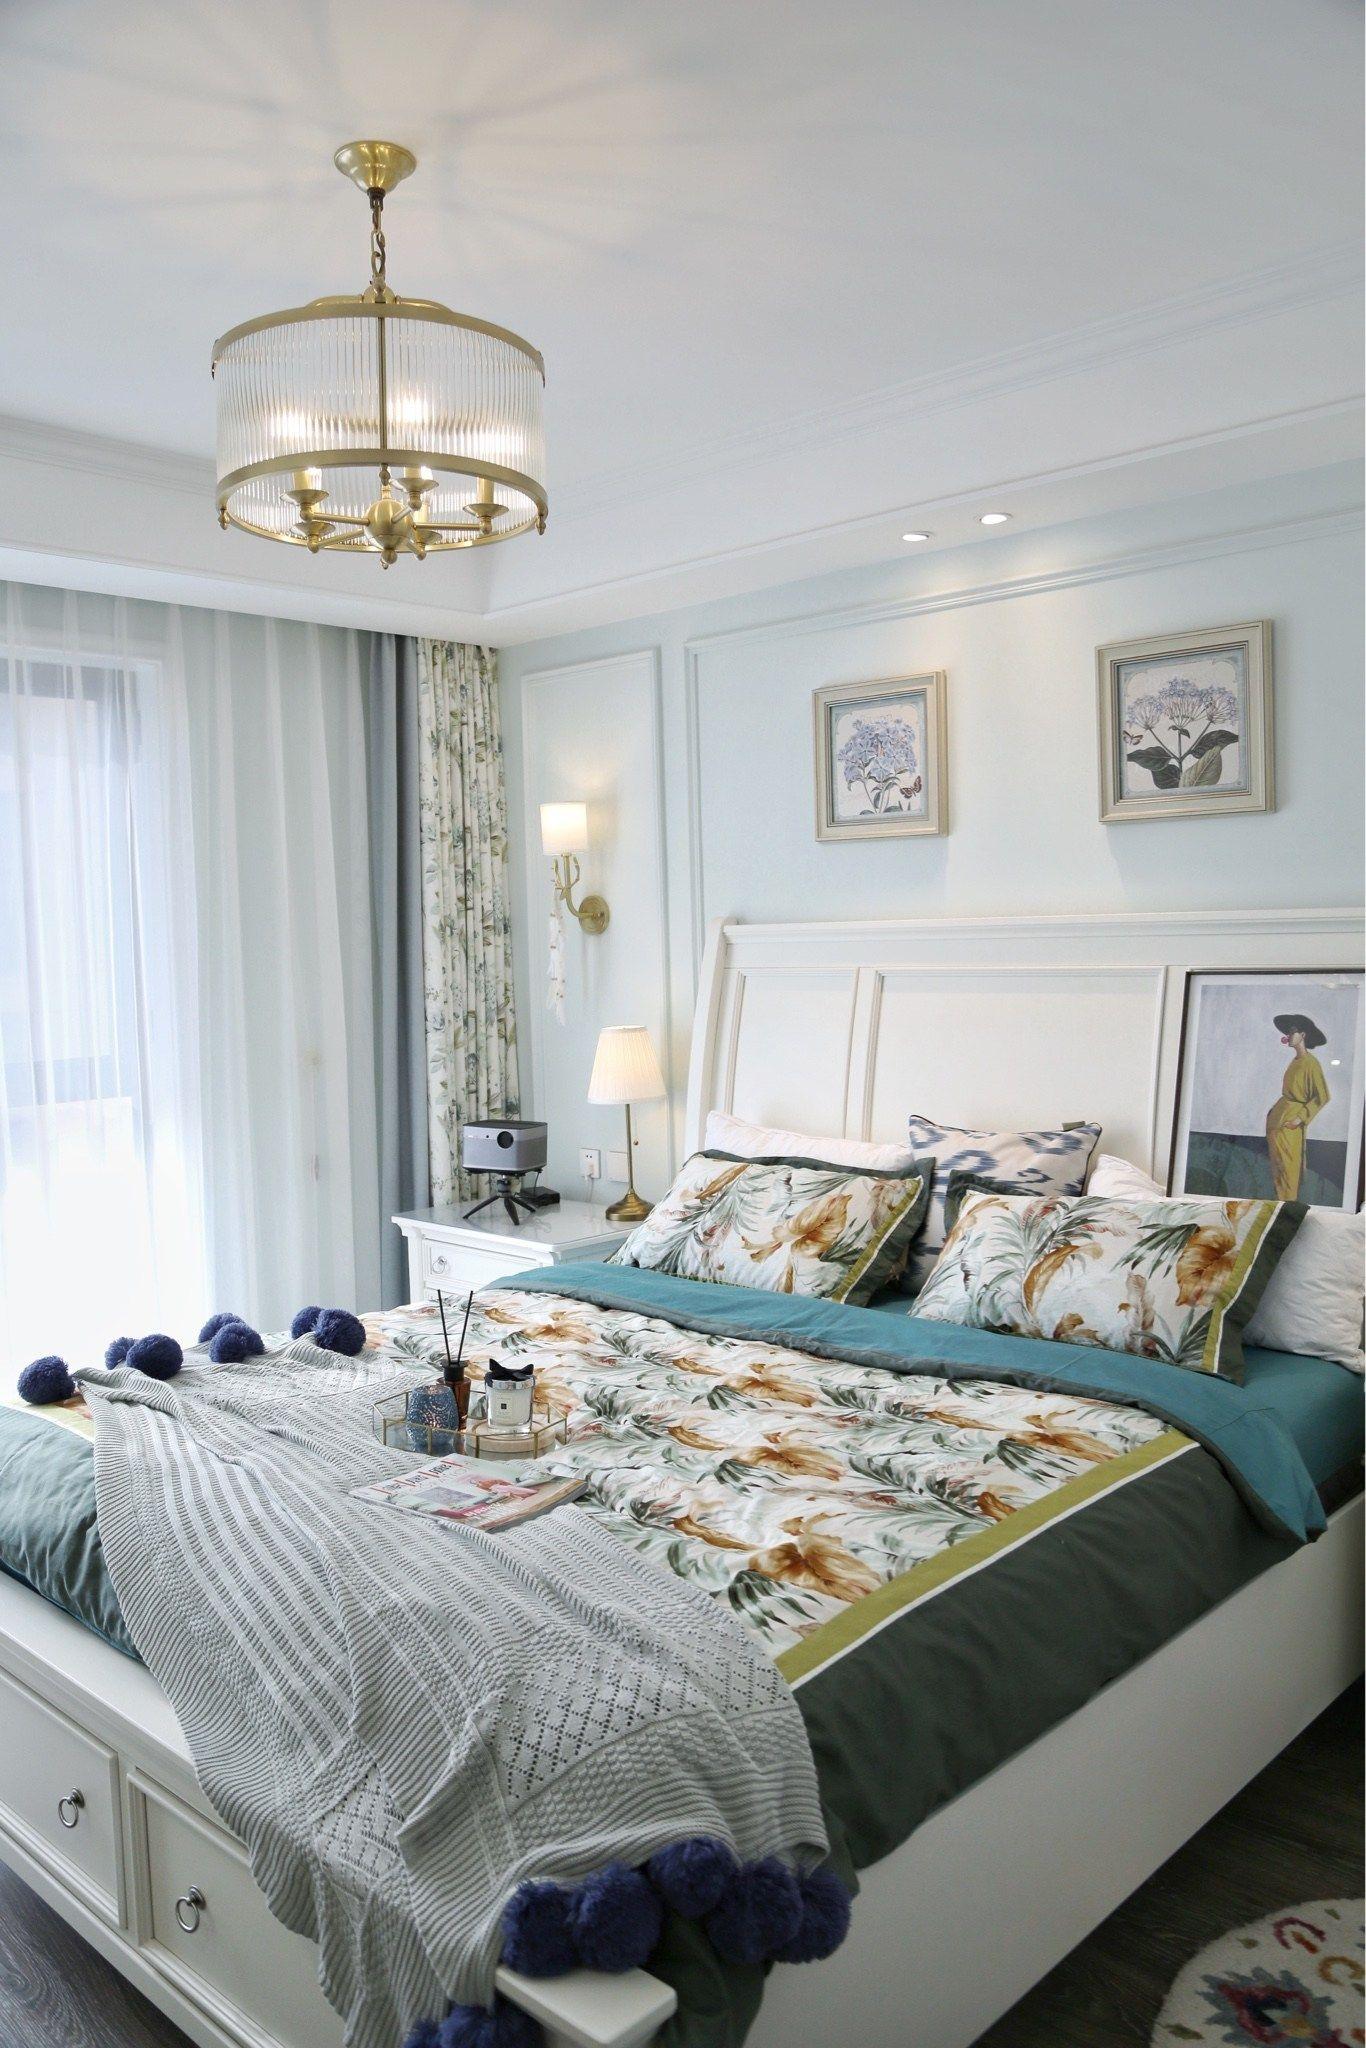 33 Incredible Master Bedrooms Design Ideas Best Decoration Idea Master Bedroom Design Master Bedrooms Decor Bedroom Design